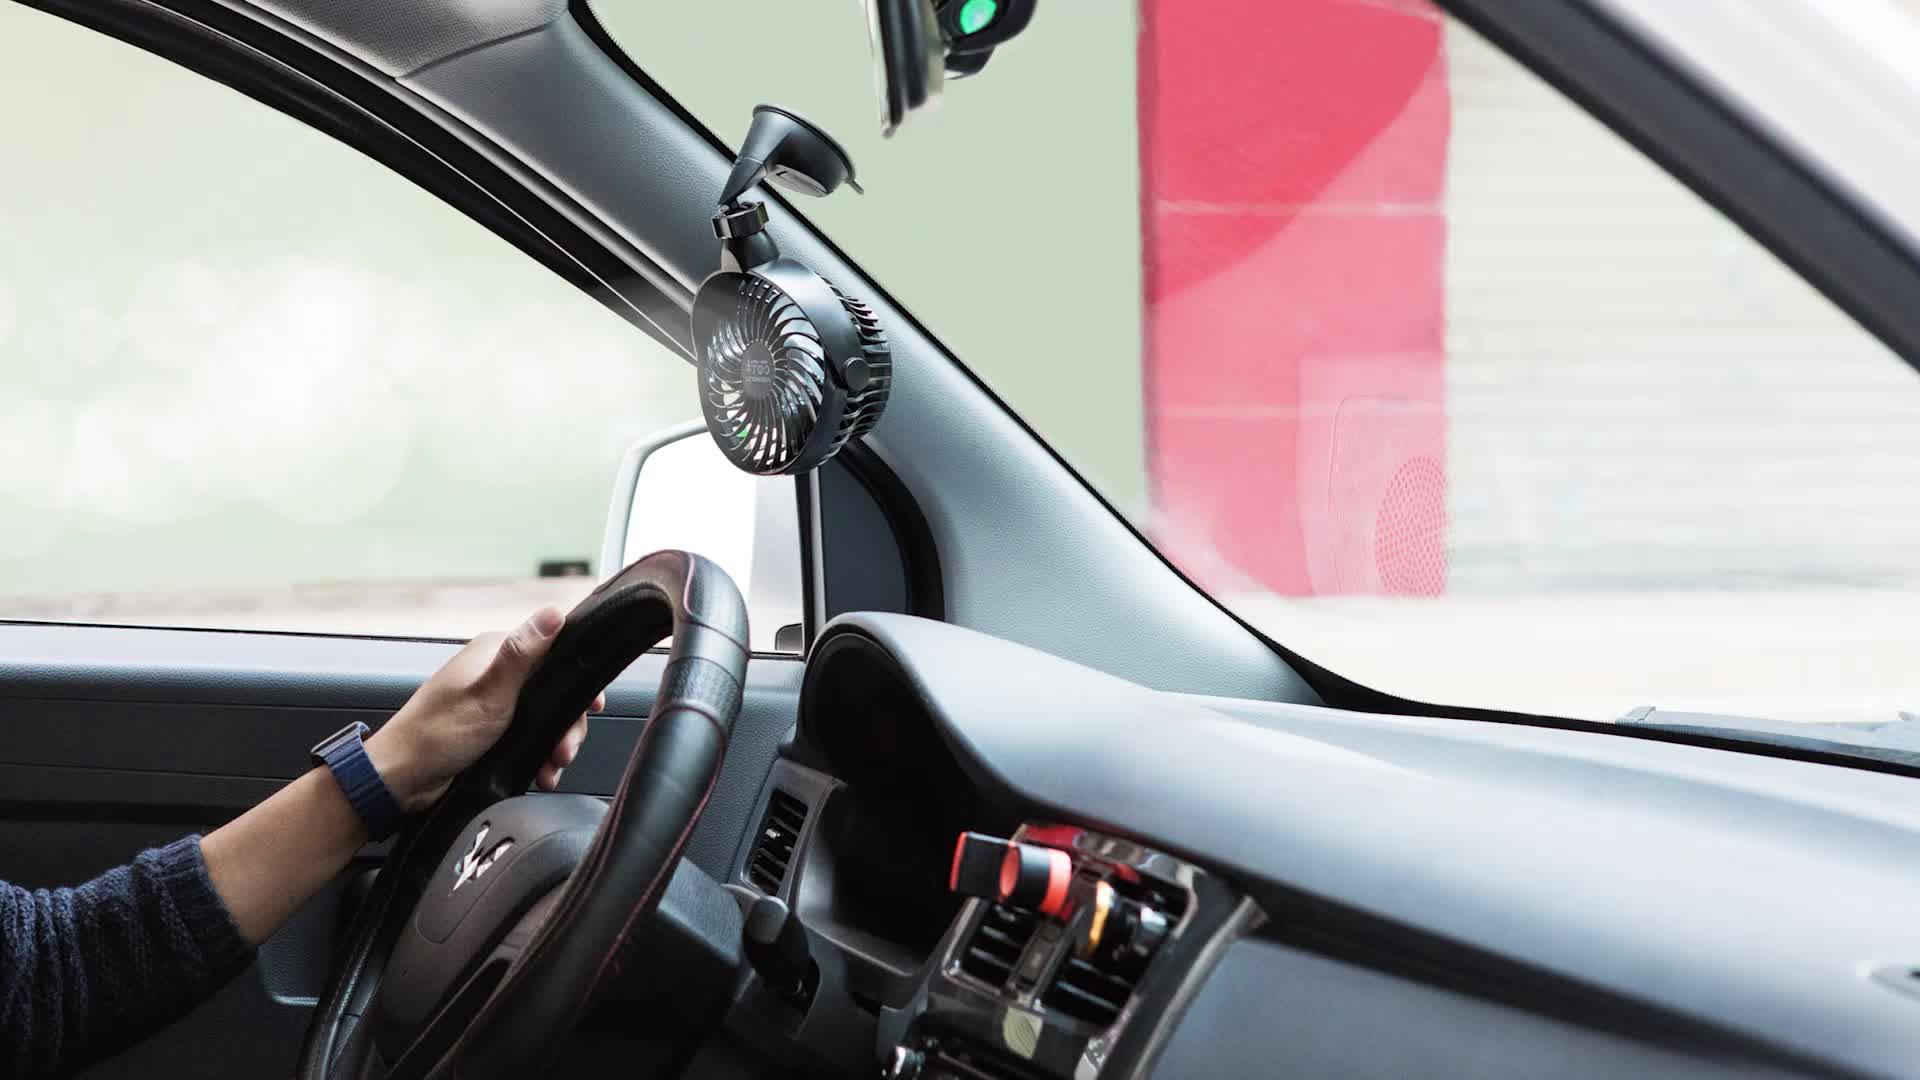 New Car Fan Mini Portable Air Conditioner For Cars - Buy Car Fan,Mini  Portable Air Conditioner,Mini Portable Air Conditioner For Cars Product on